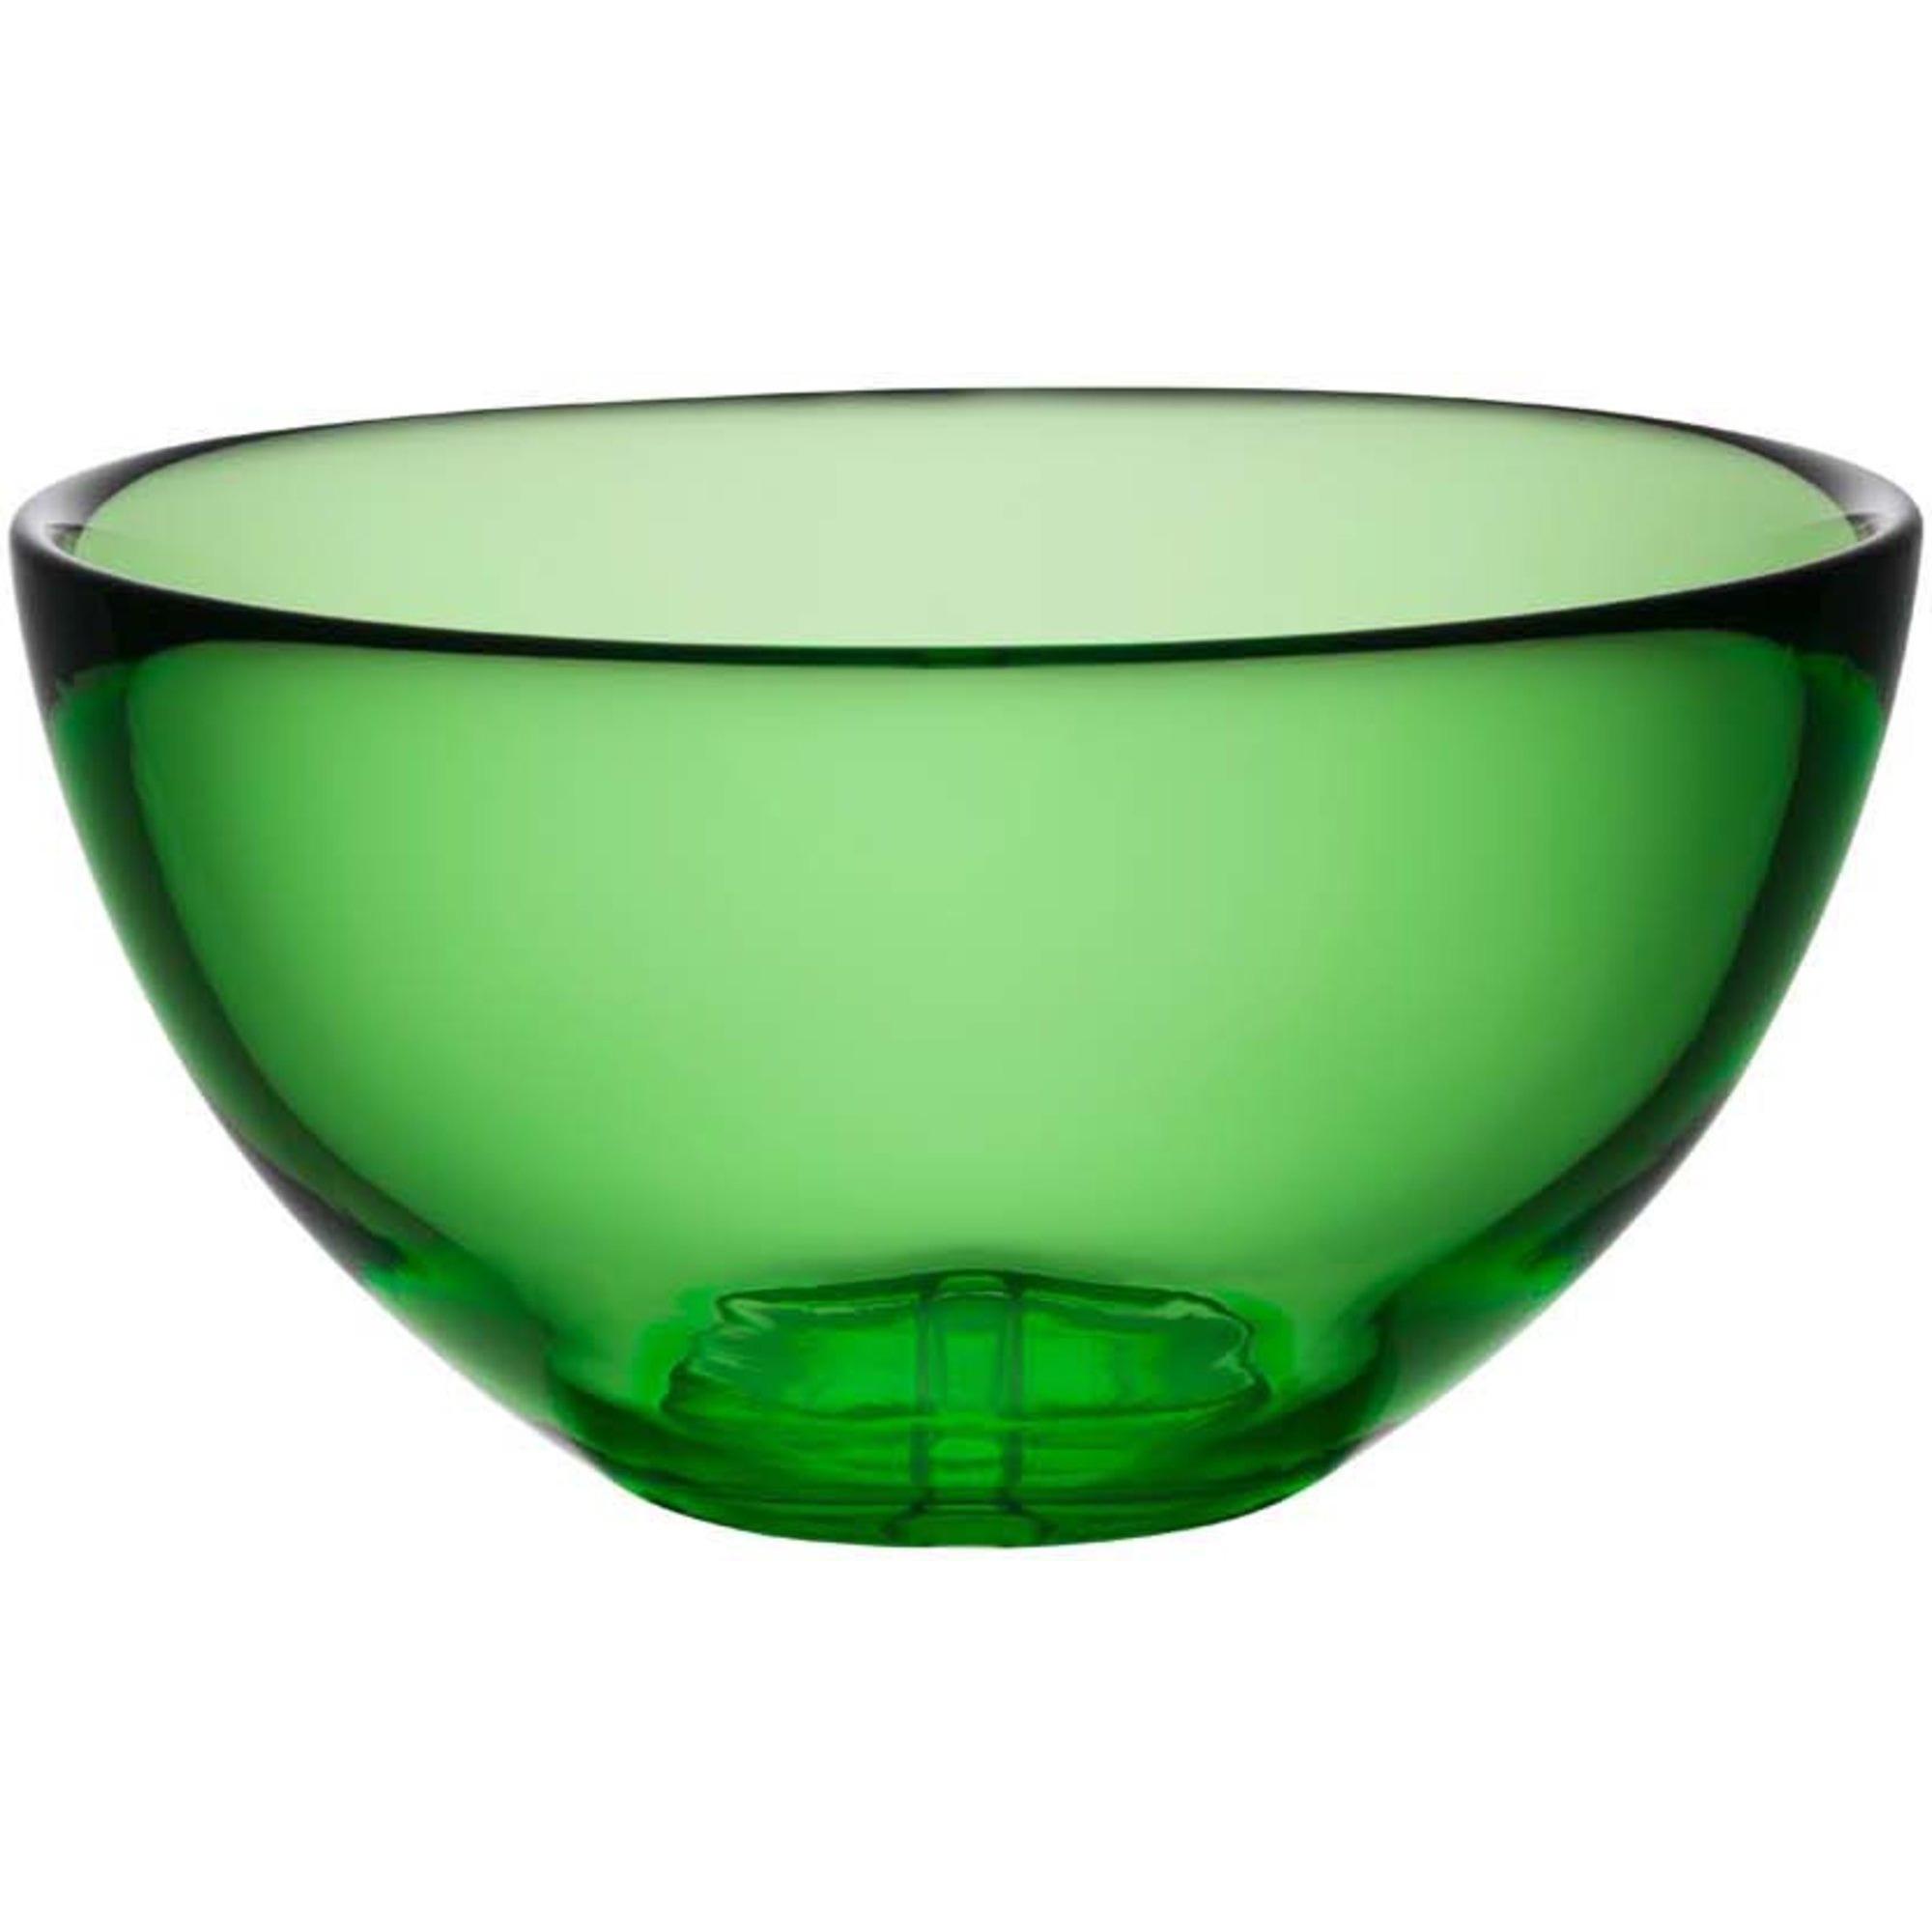 Kosta Boda Bruk Serveringsskål Apple Green Small